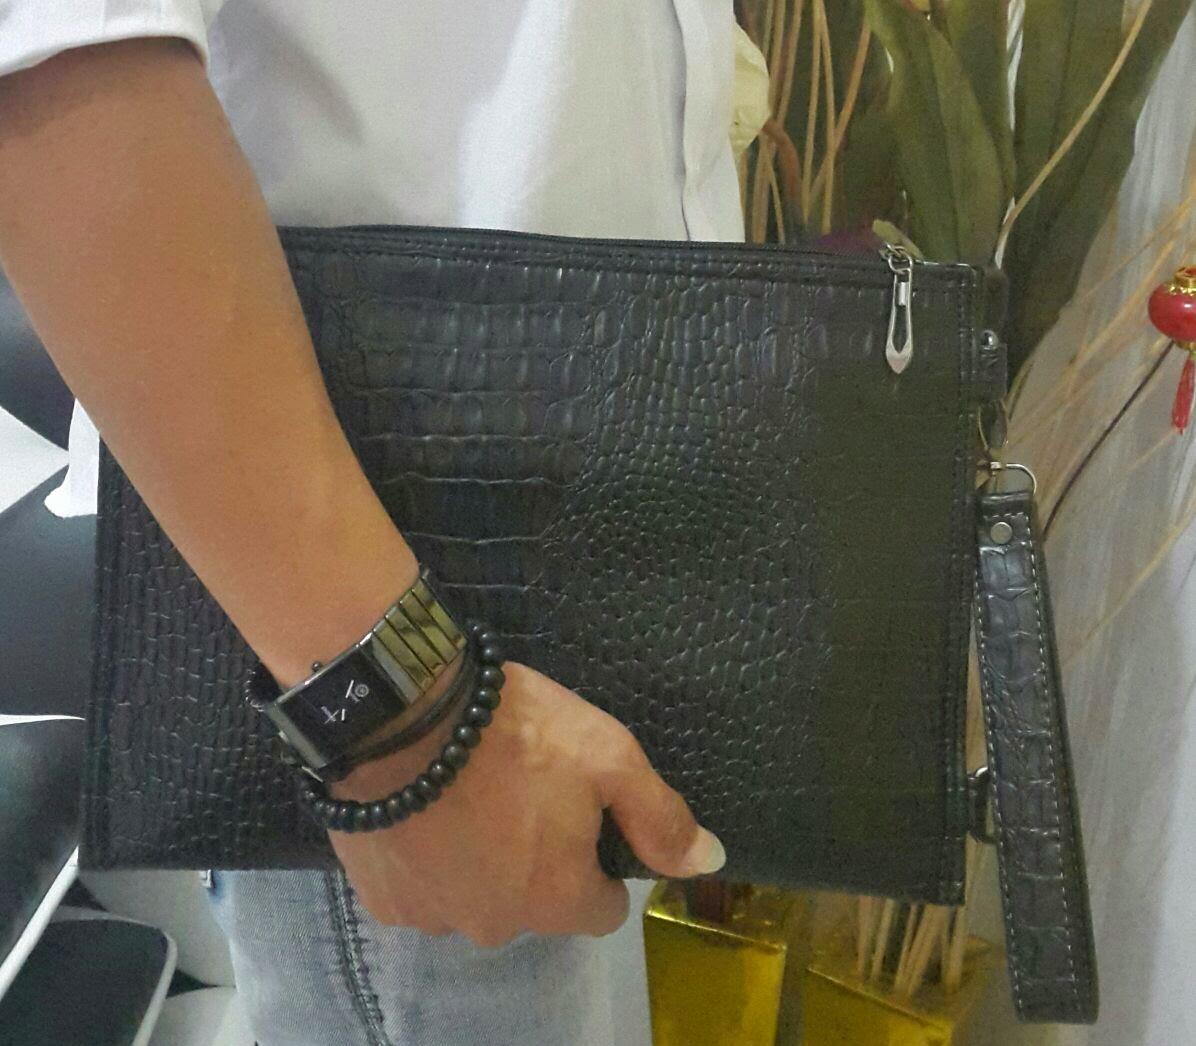 Clutch bag motif croco warna hitam kualitas kulit asli tas fashio terkini